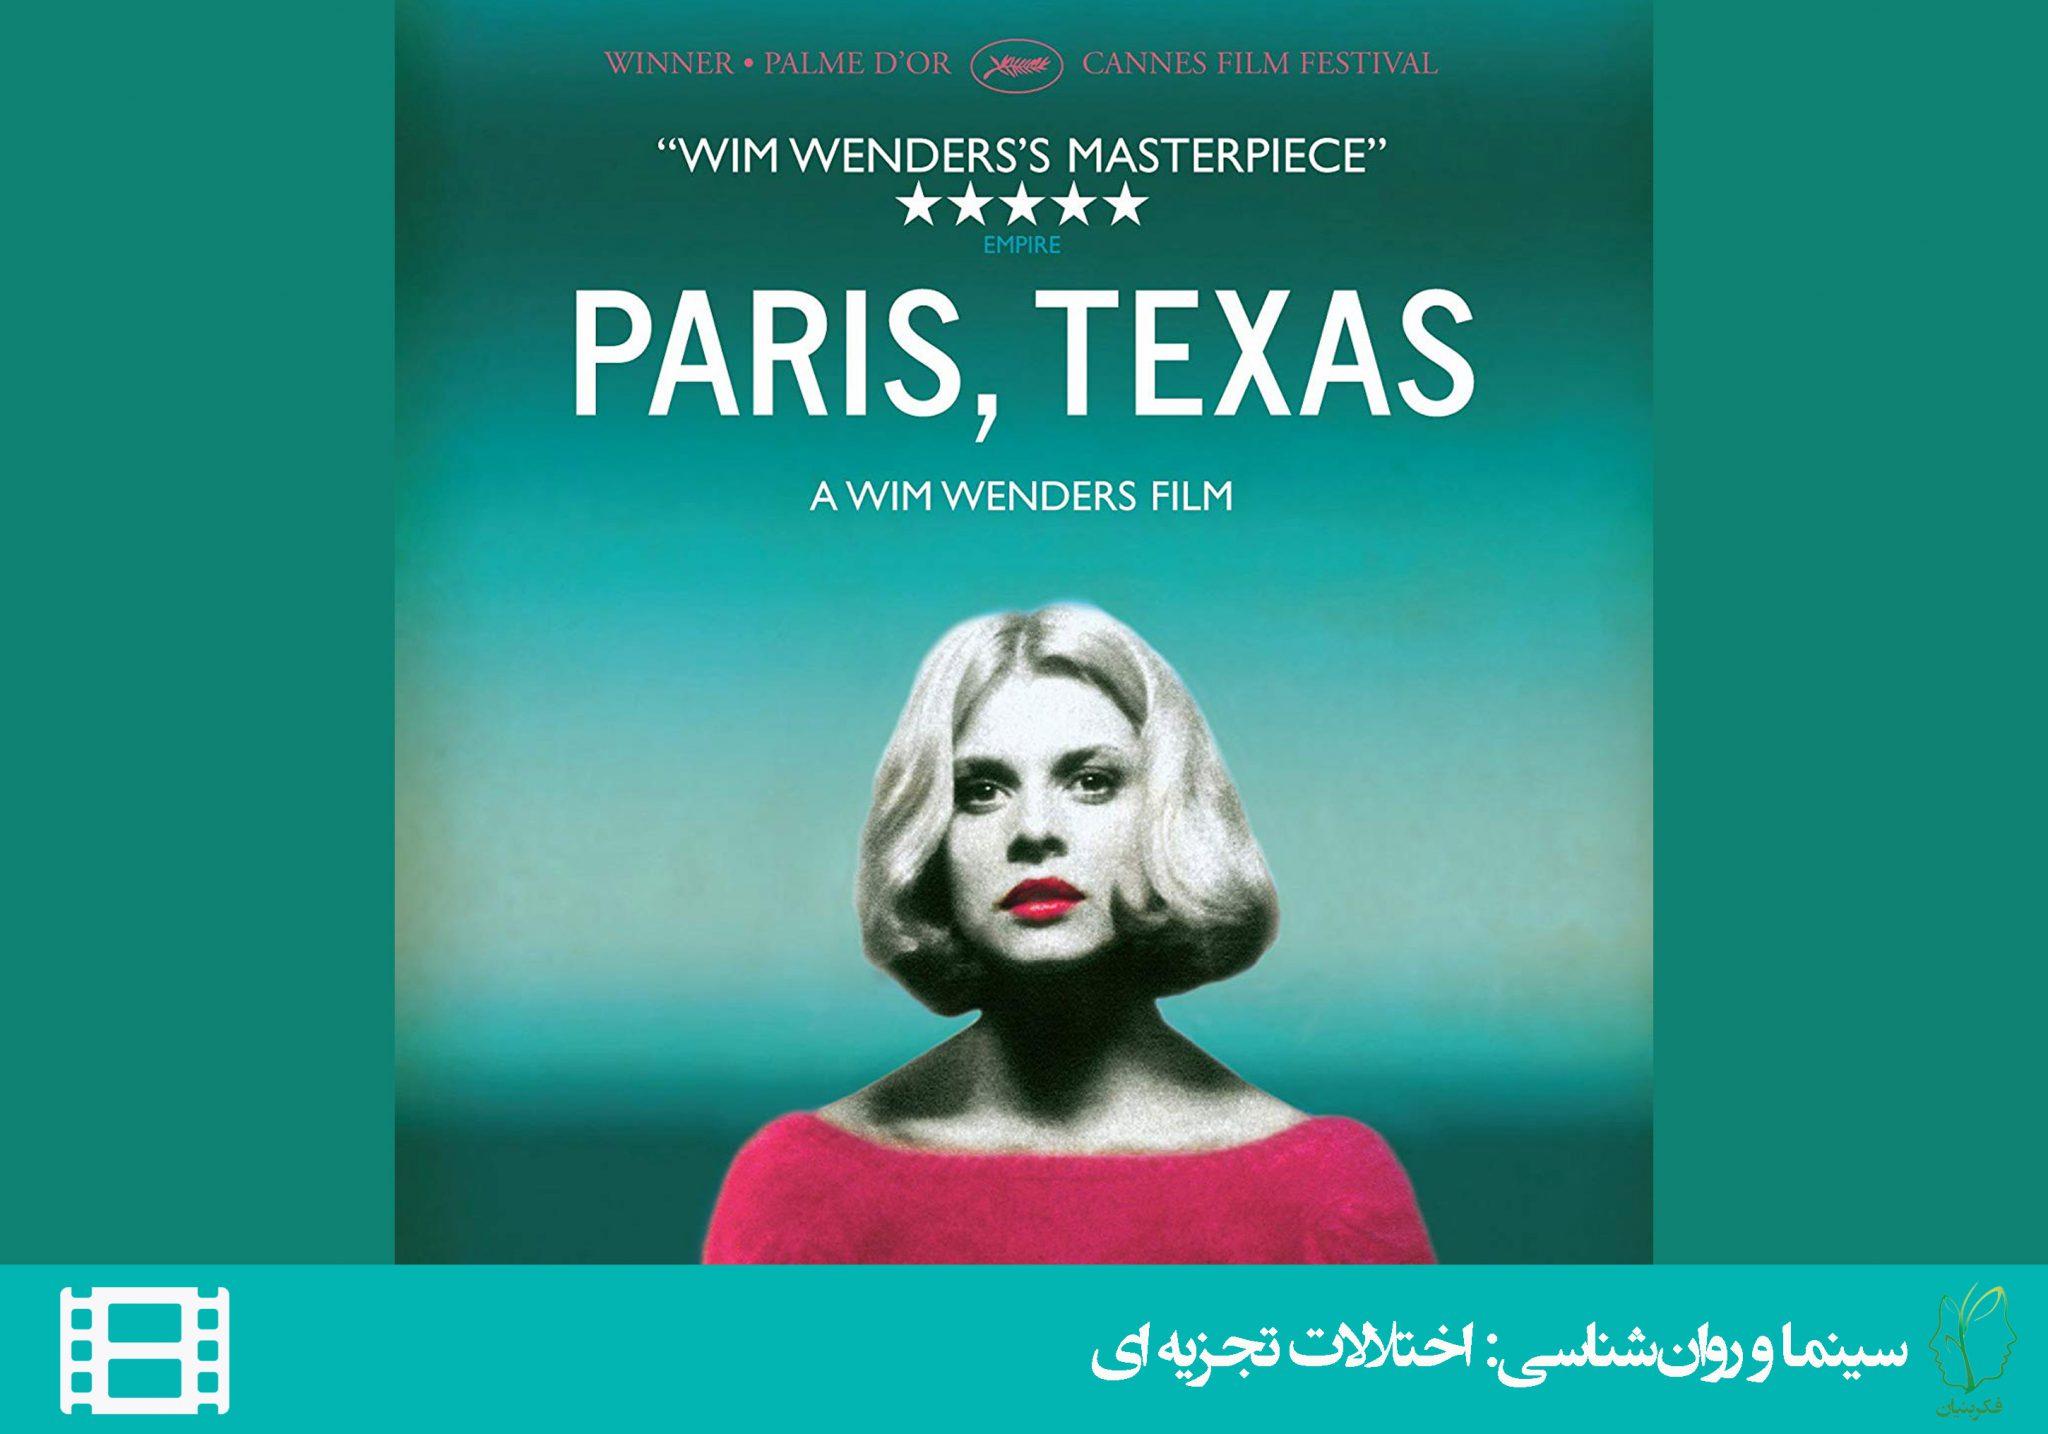 فیلم پاريس، تگزاس